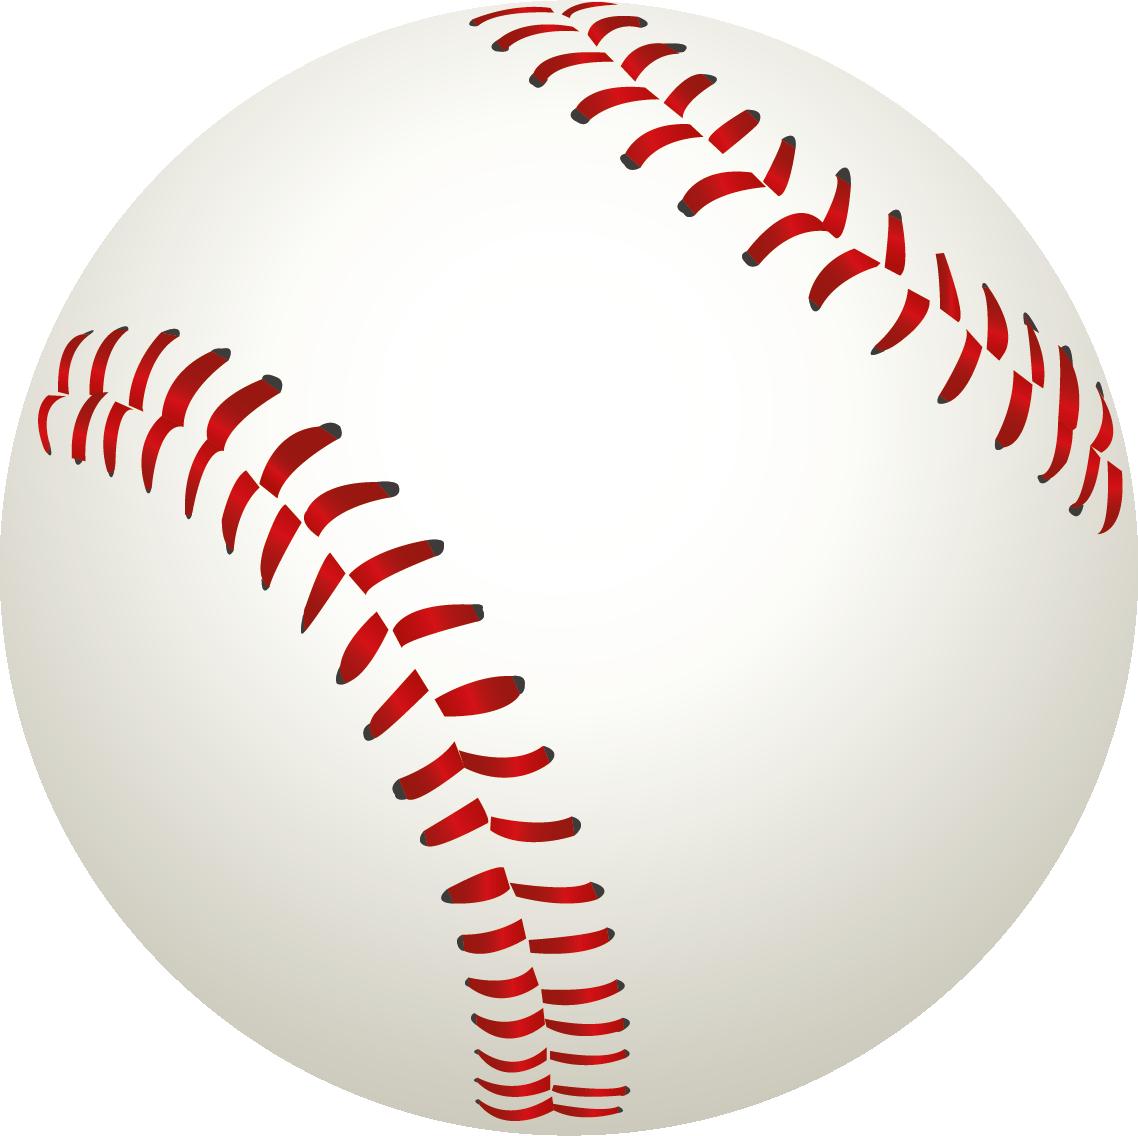 Baseball clip art images clipart-Baseball clip art images clipart-8